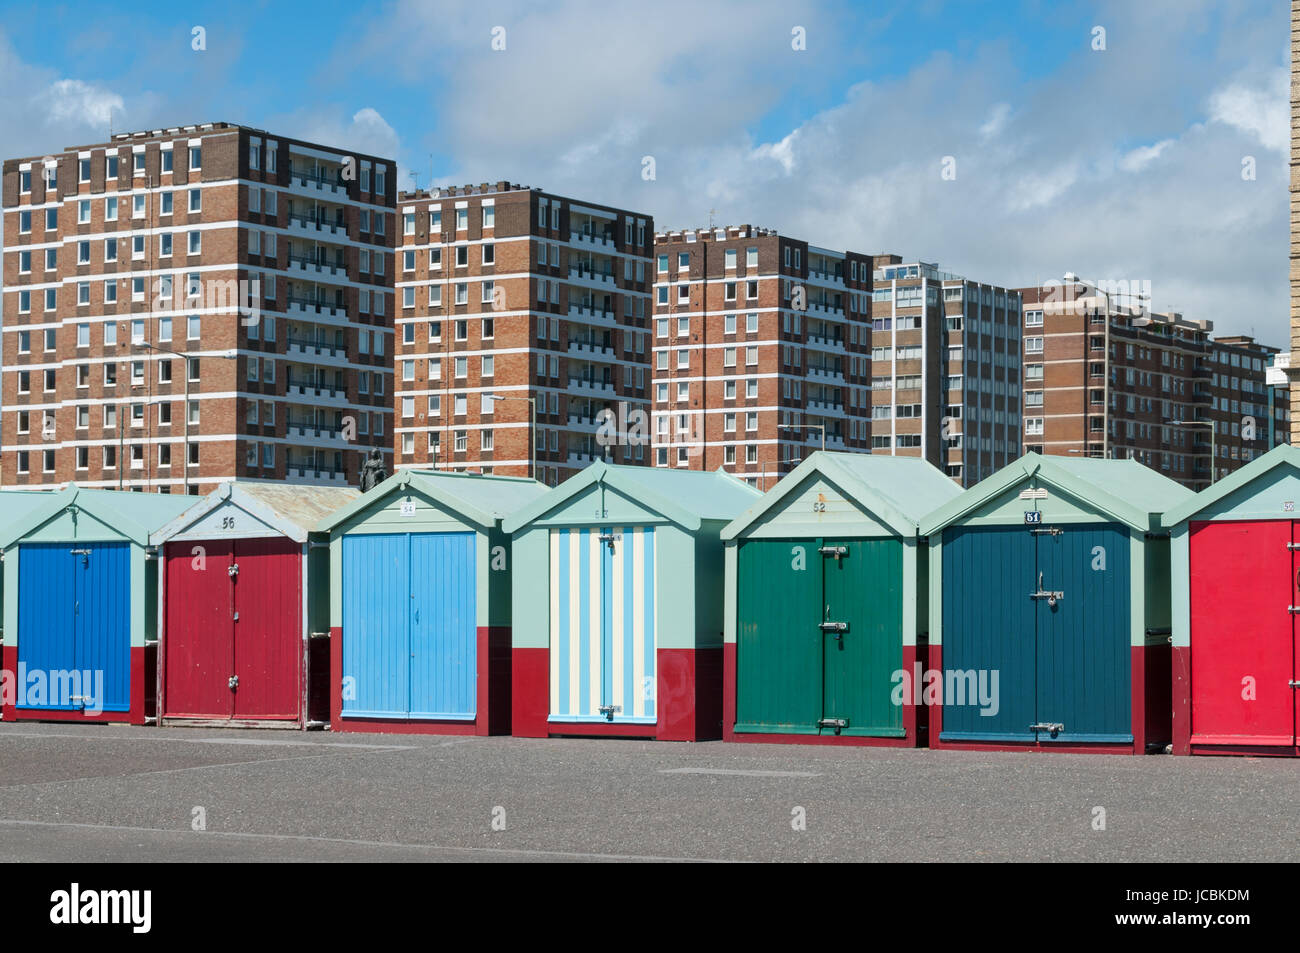 Hove beach huts, United Kingdom - Stock Image